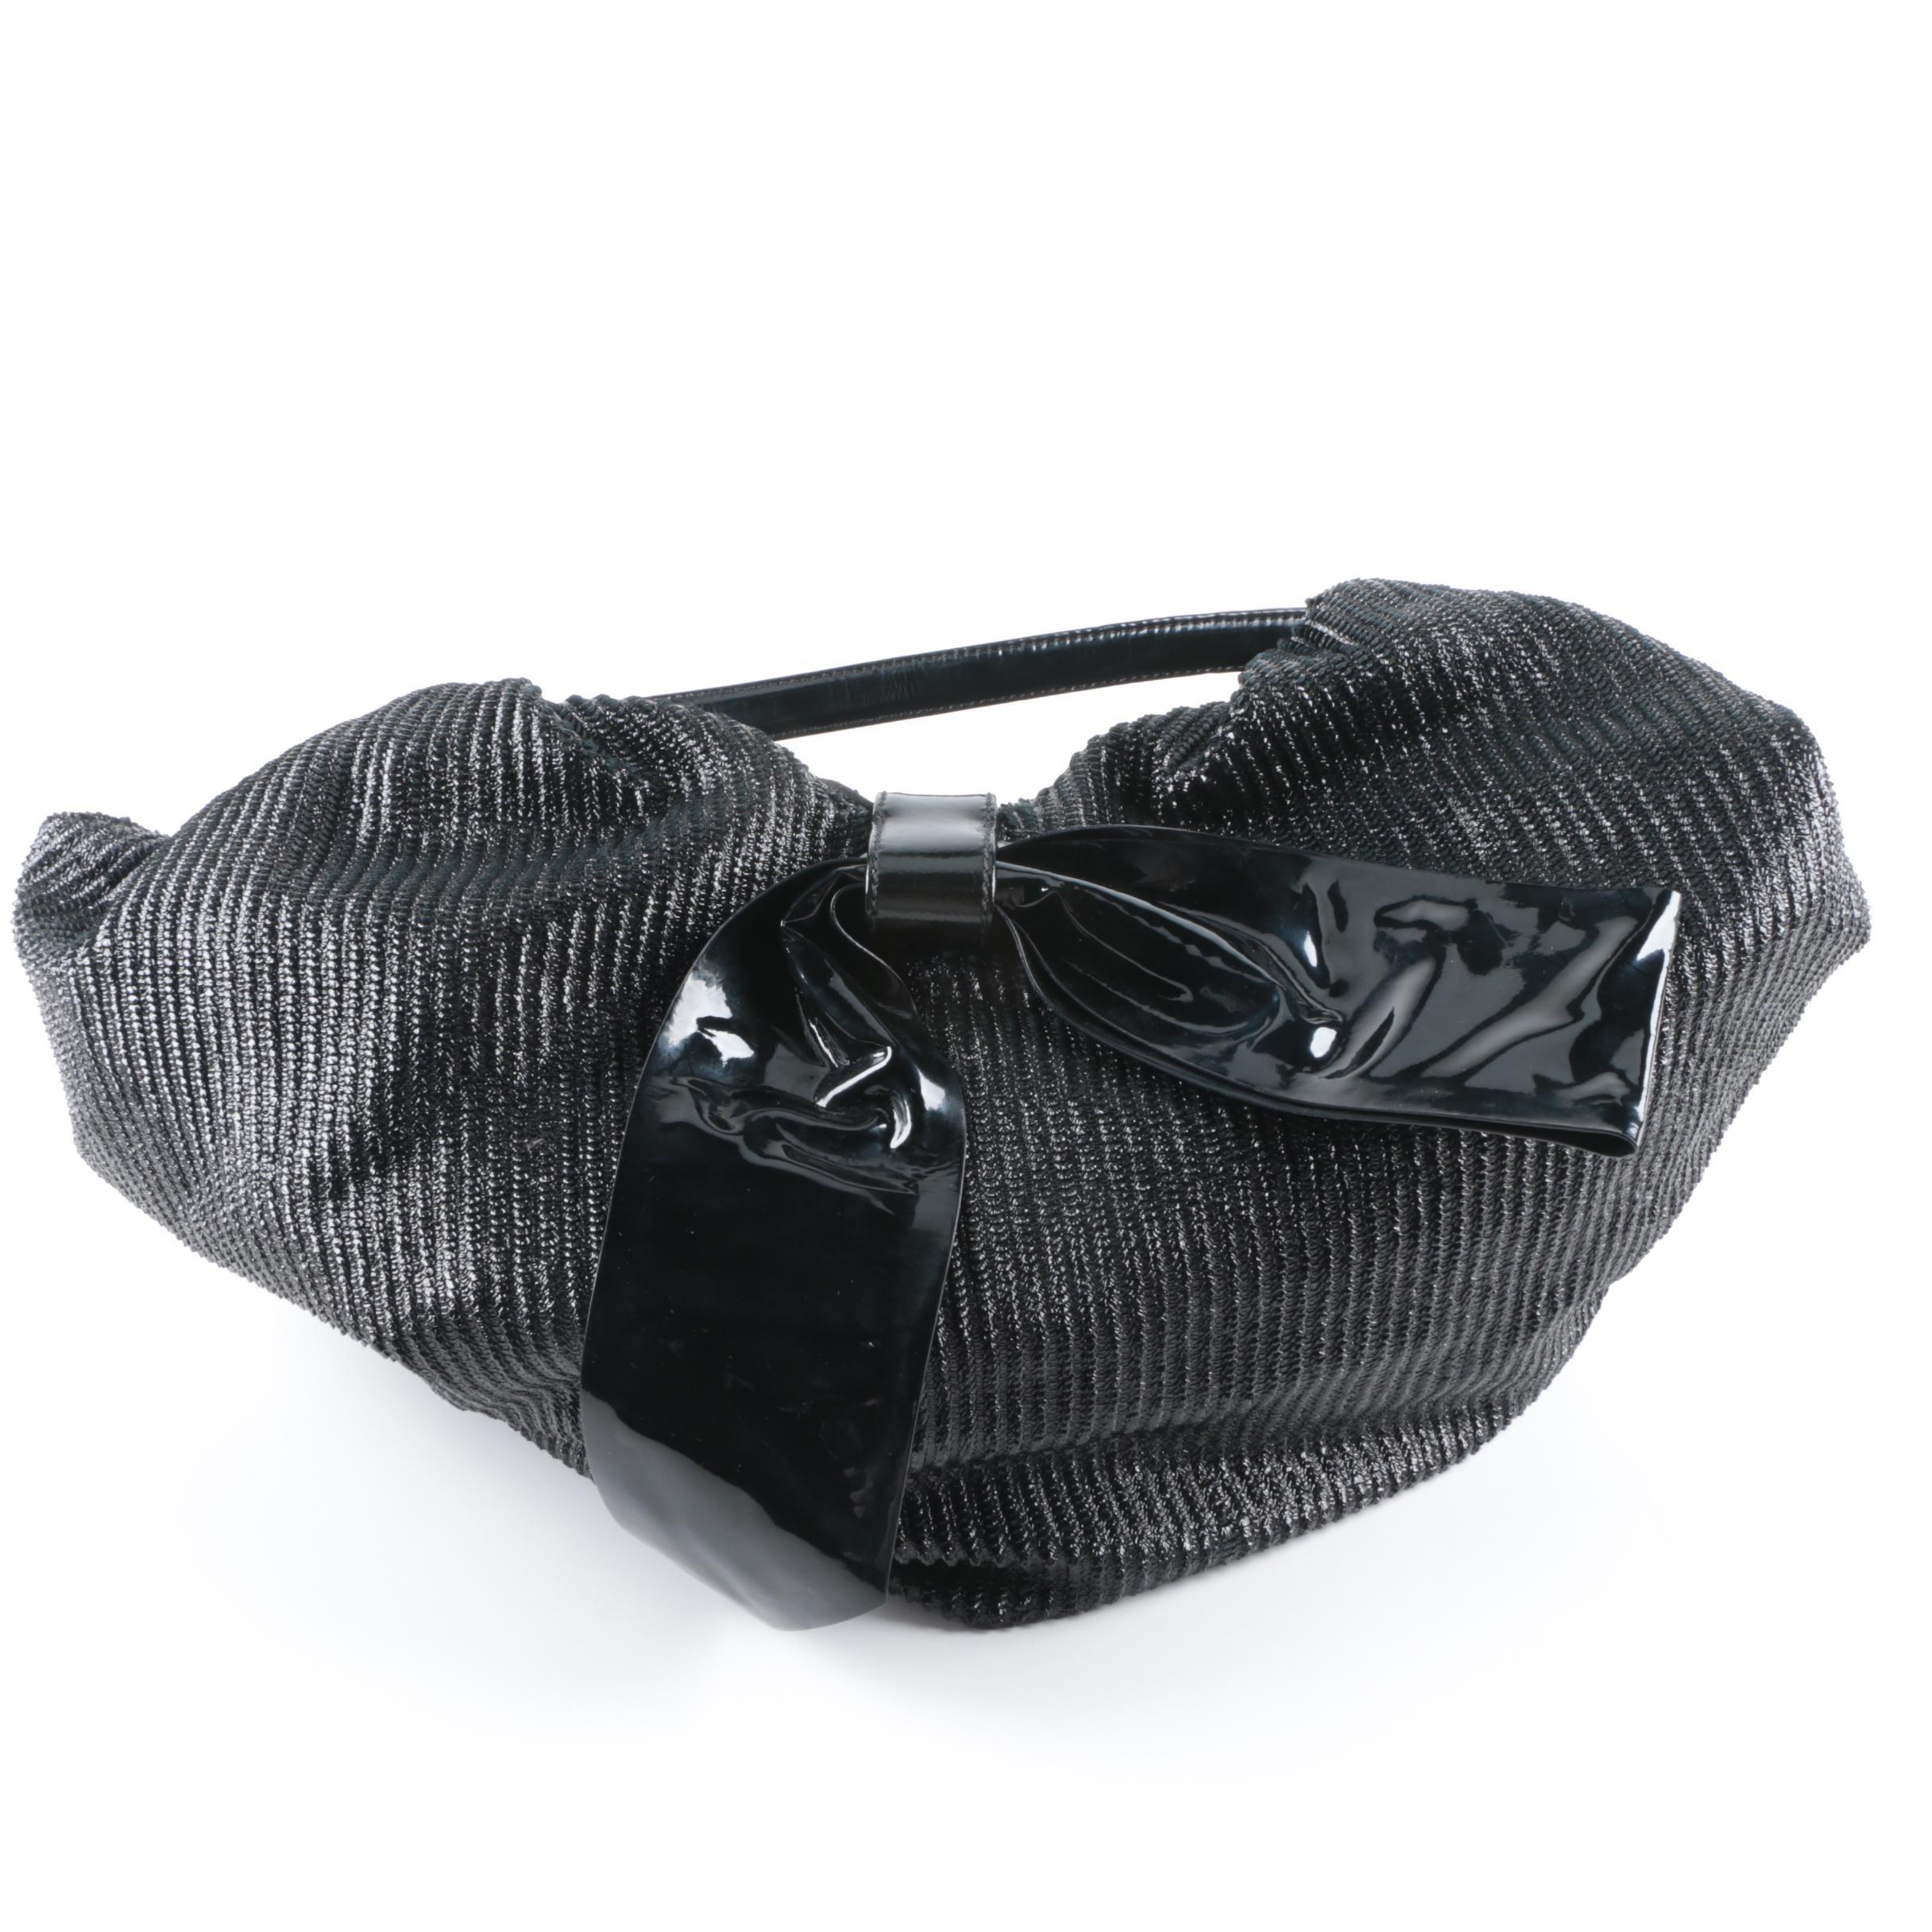 Valentino Garavani Textured and Patent Leather Handbag